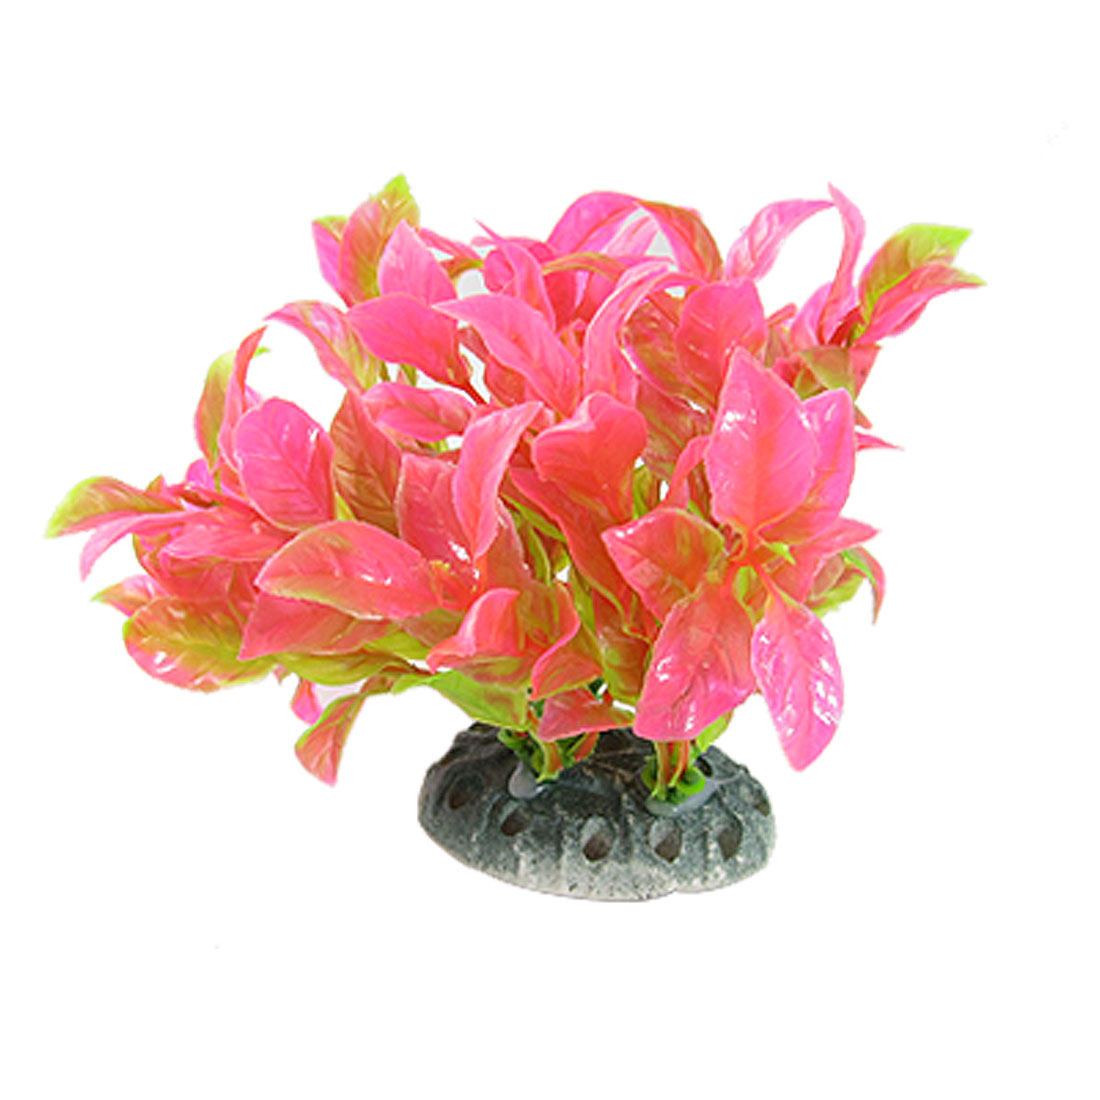 Hot Pink Green Plastic Underwater Float Grass Aquarium Decor Ornament